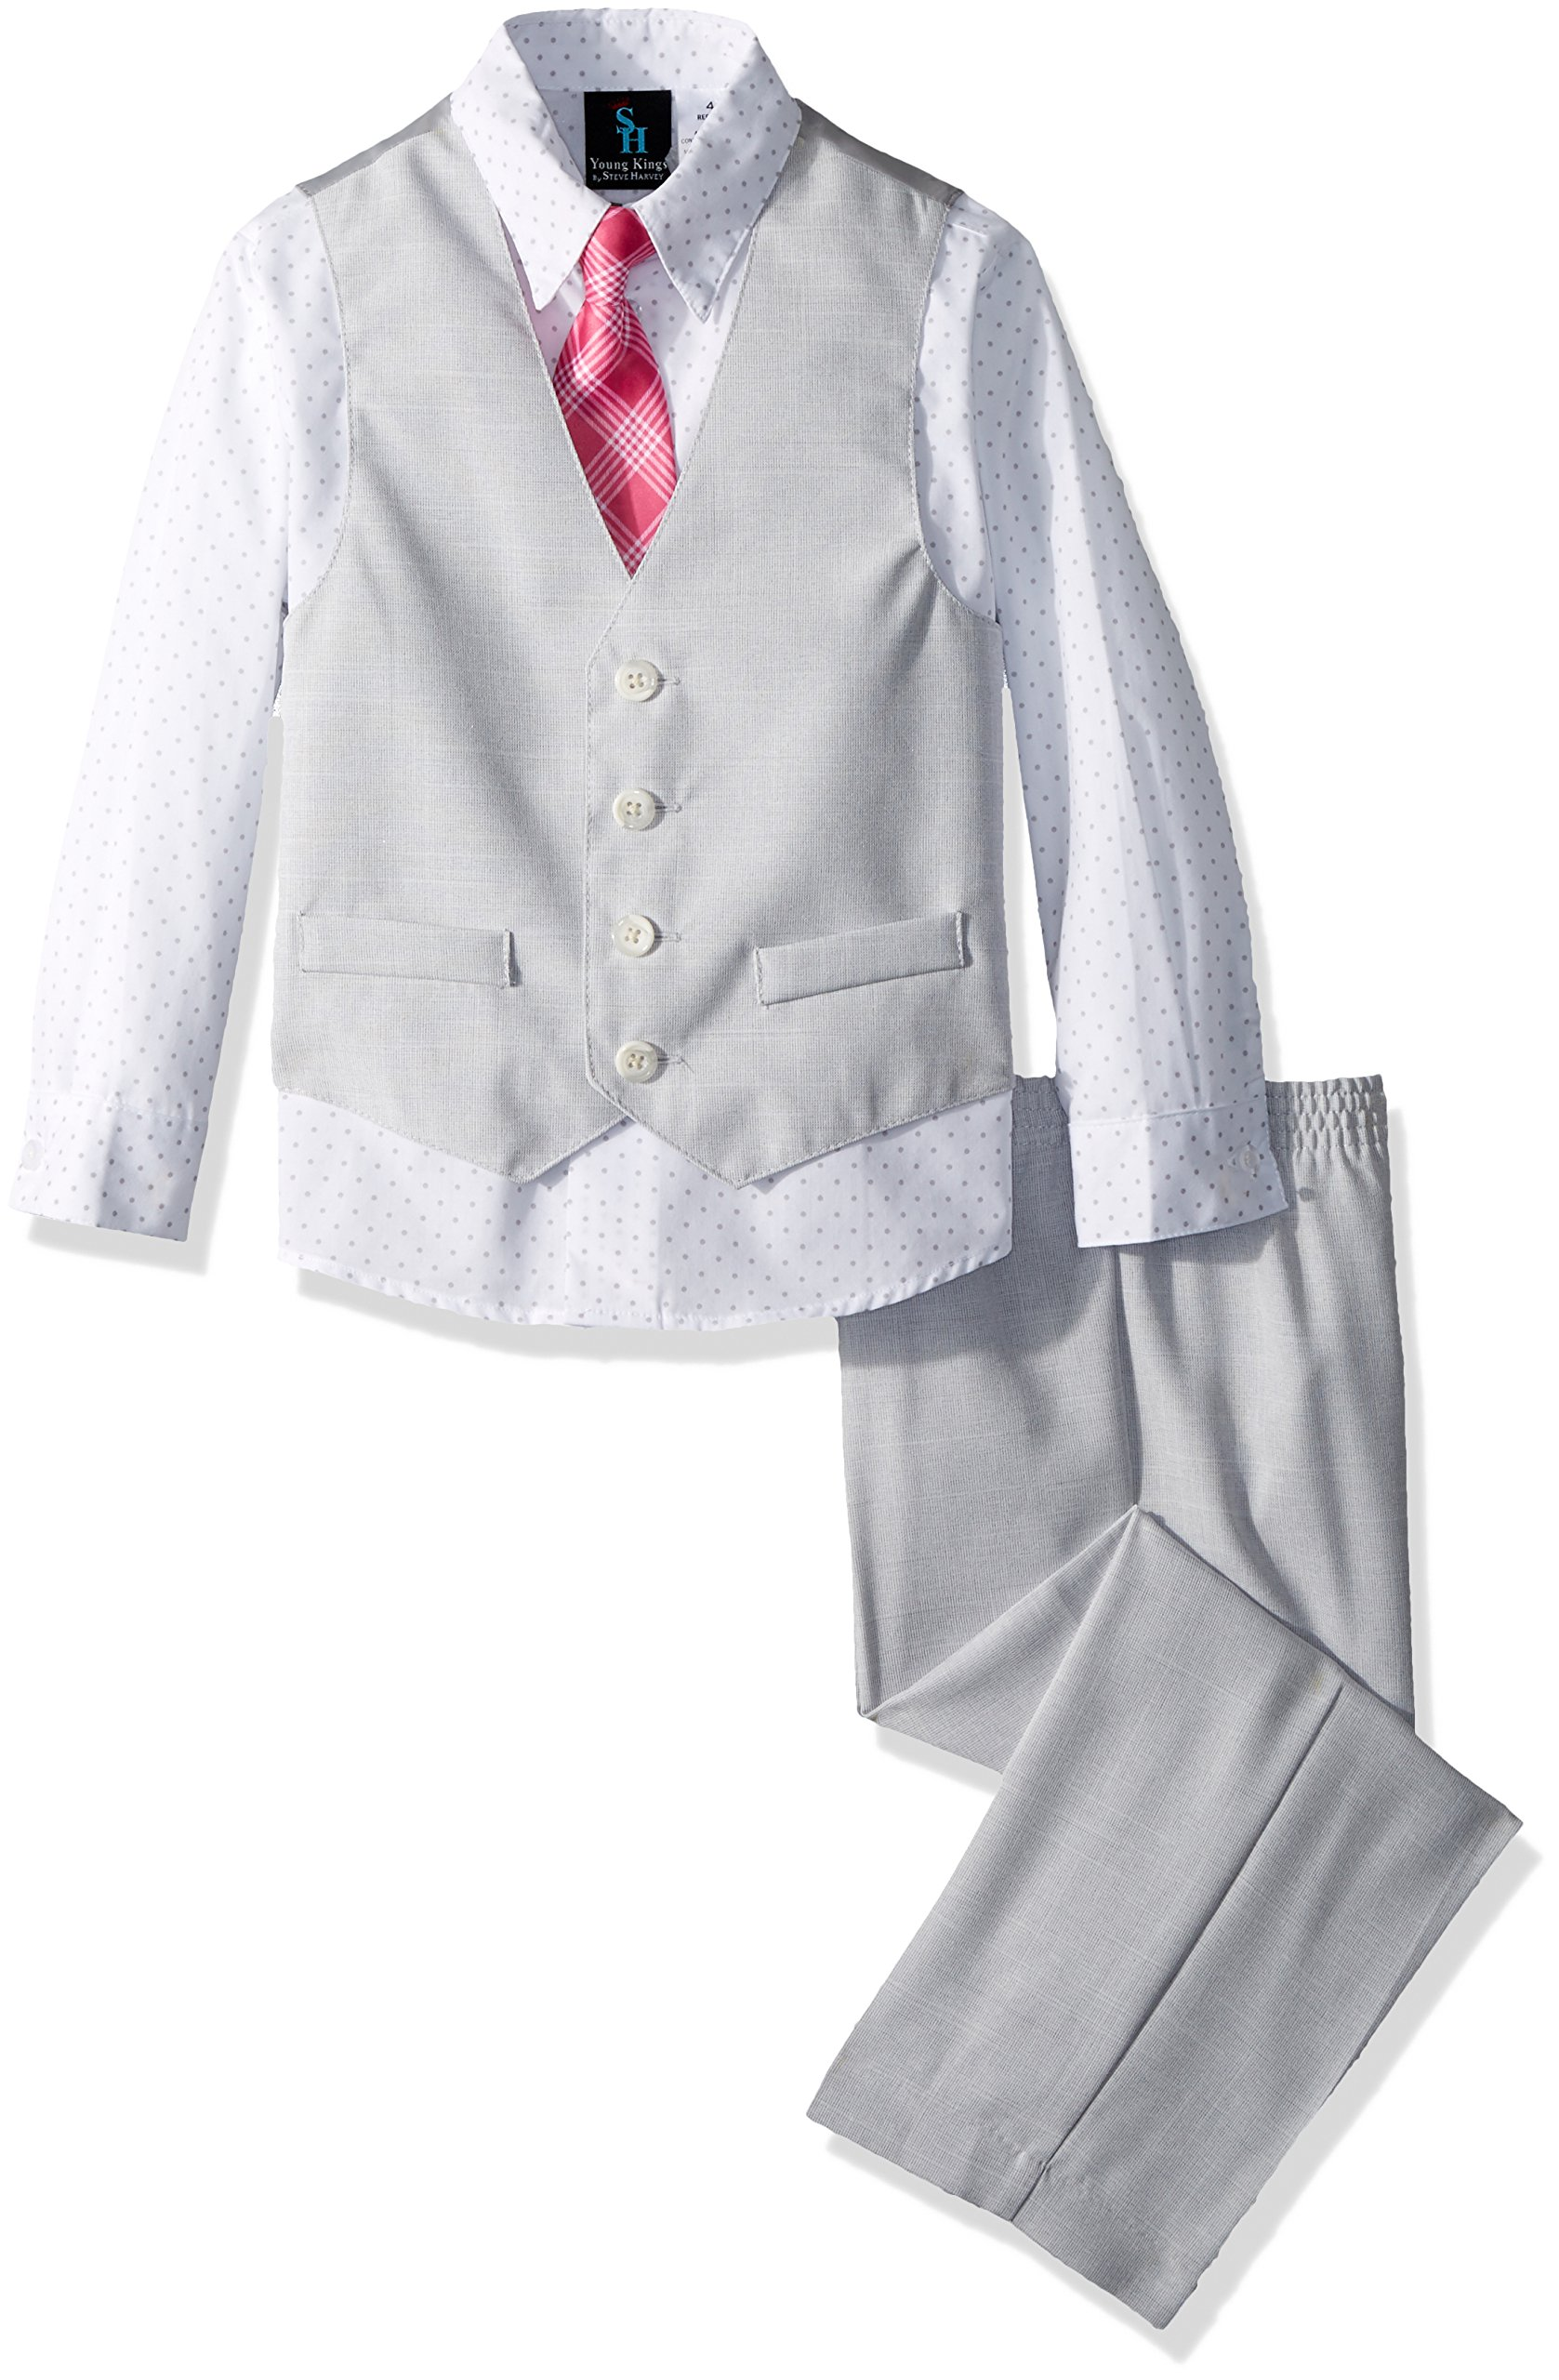 Steve Harvey Boys' Toddler Four Piece Vest Set, Sterling slub, 3T